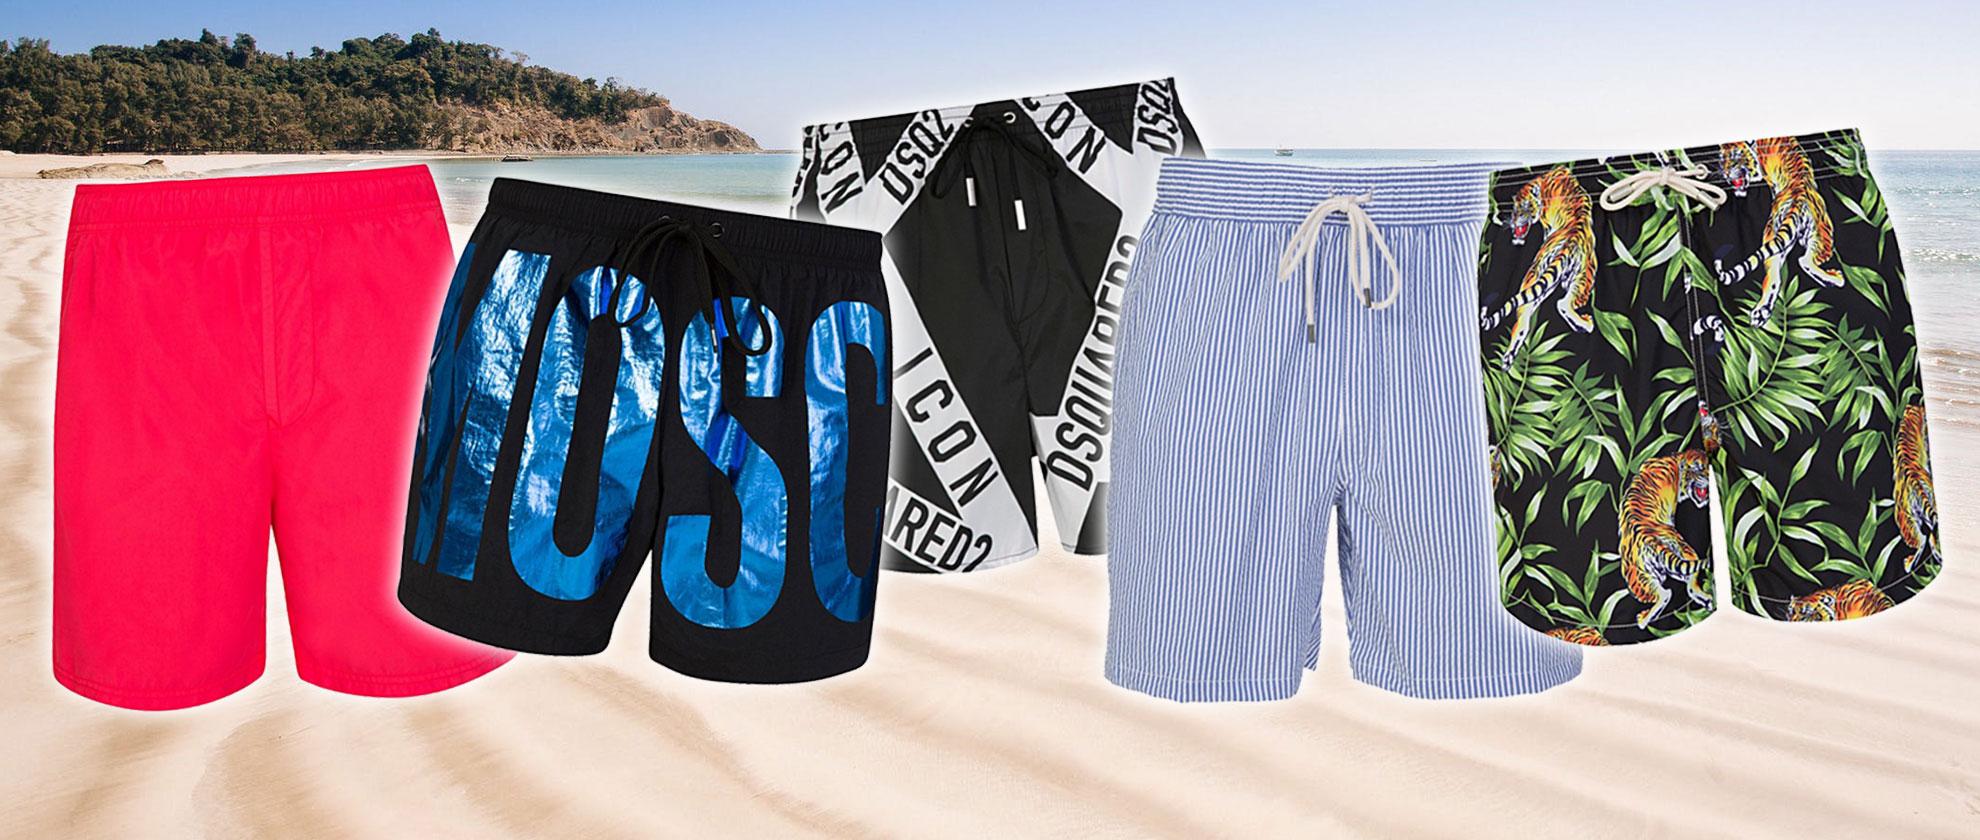 Men's most wanted sensational swimwear shorts